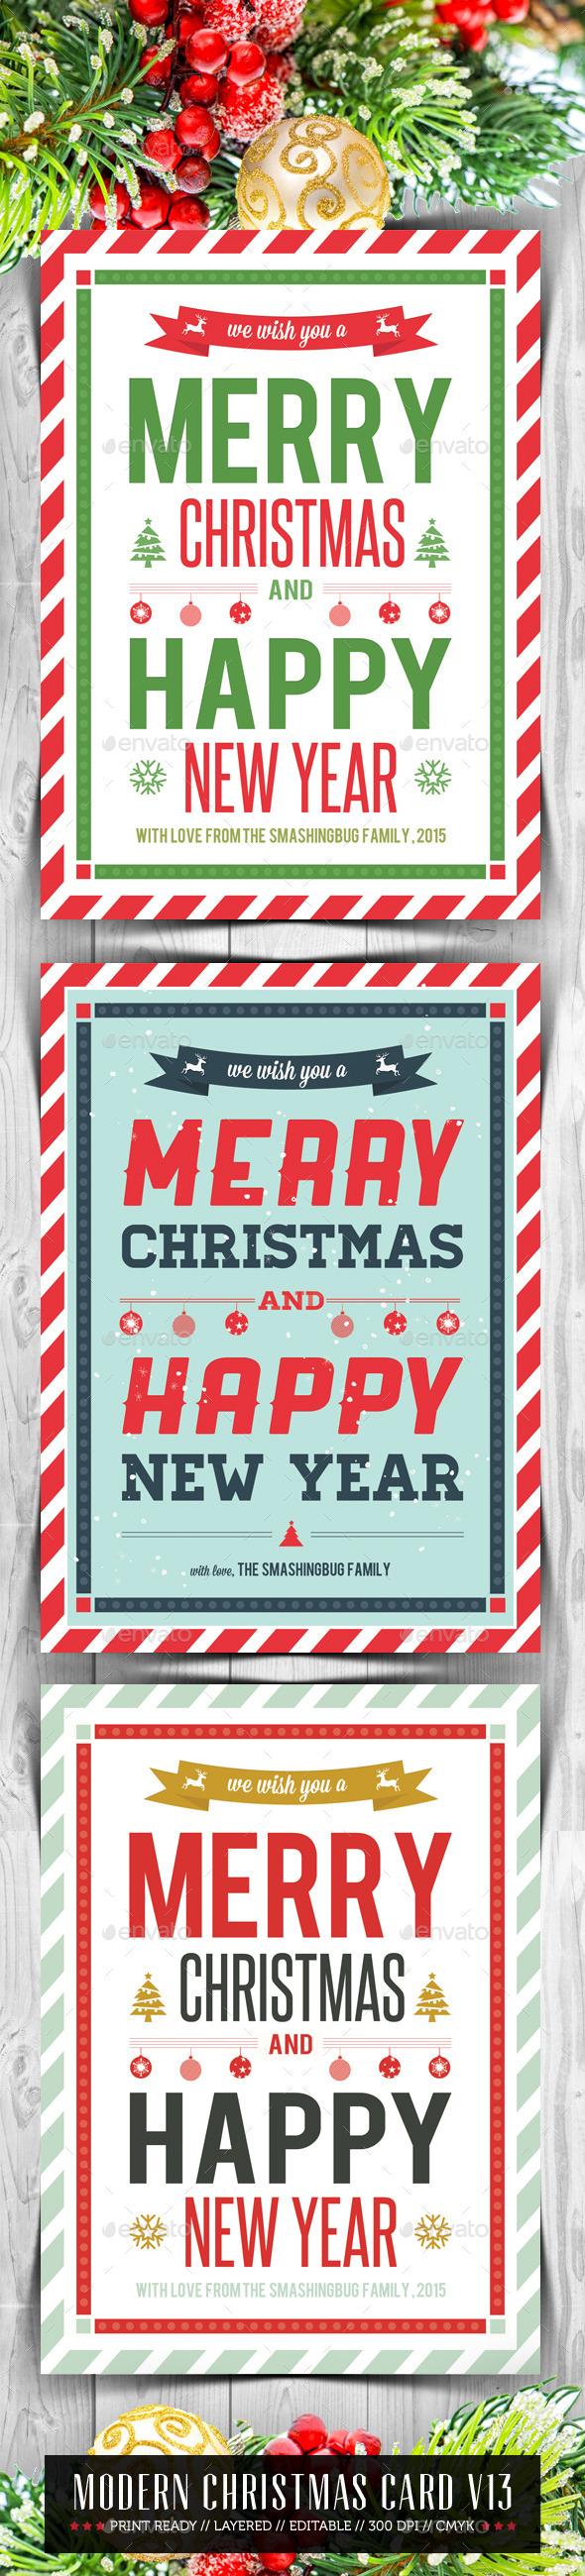 GraphicRiver Modern Christmas Card V13 9754434